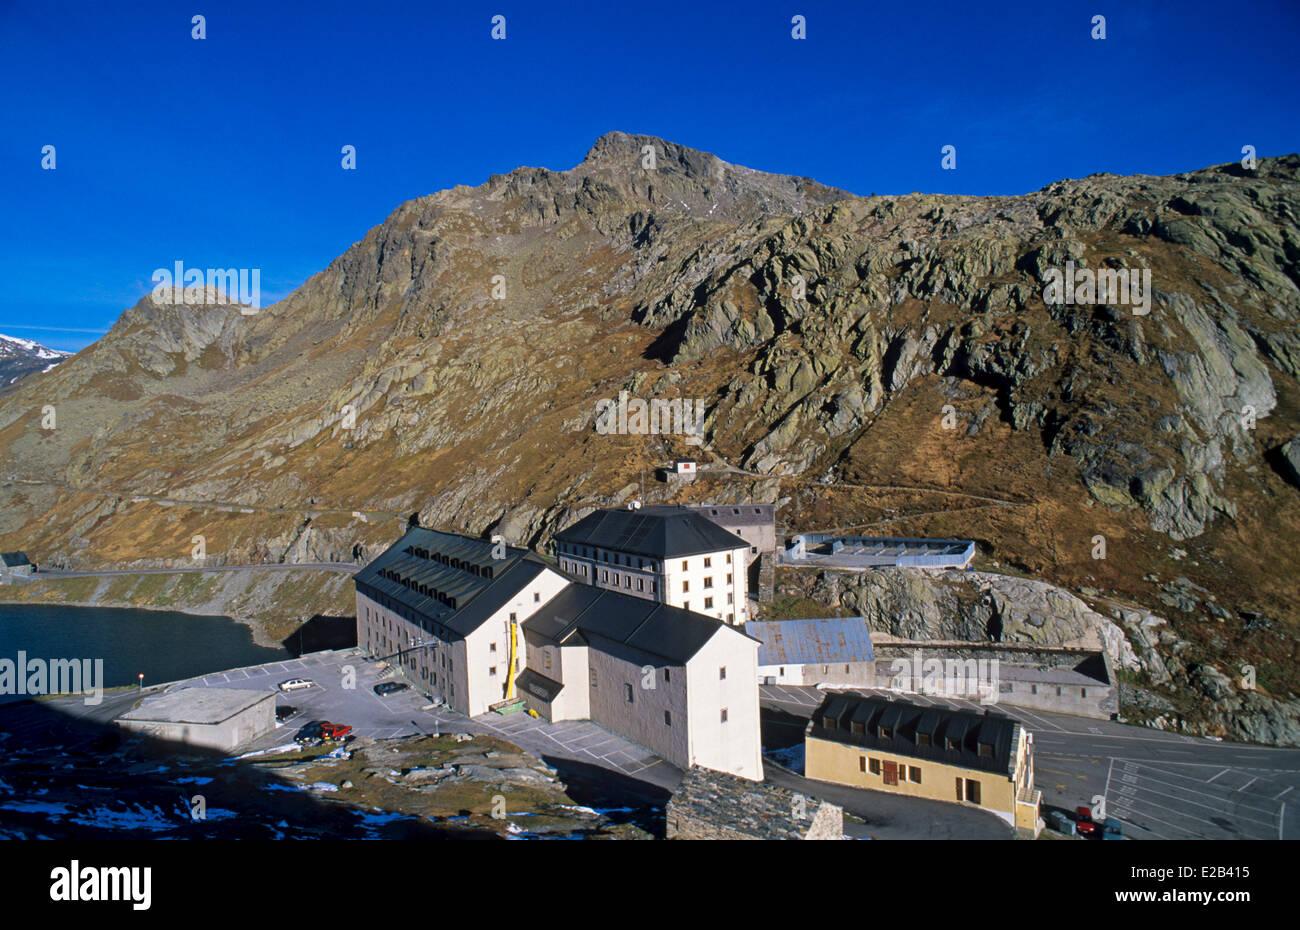 Switzerland, Mont Blanc Massif, pass, lake and hospice of Grand Saint Bernard - Stock Image